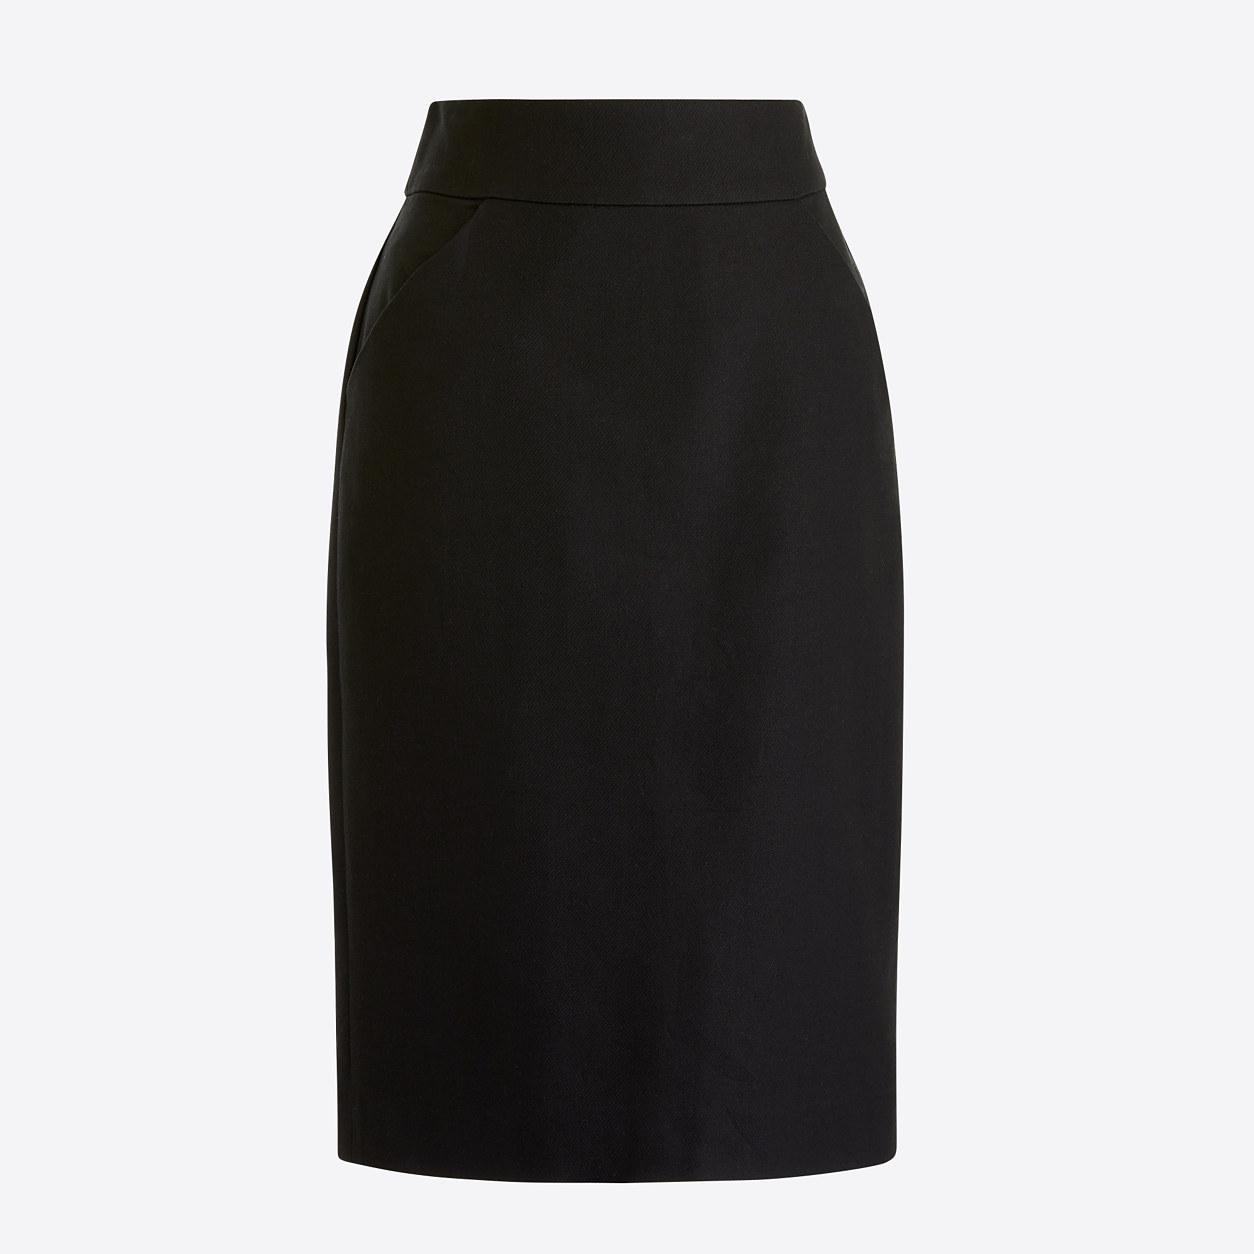 Women's Pencil Skirts | J.Crew Factory - pencil